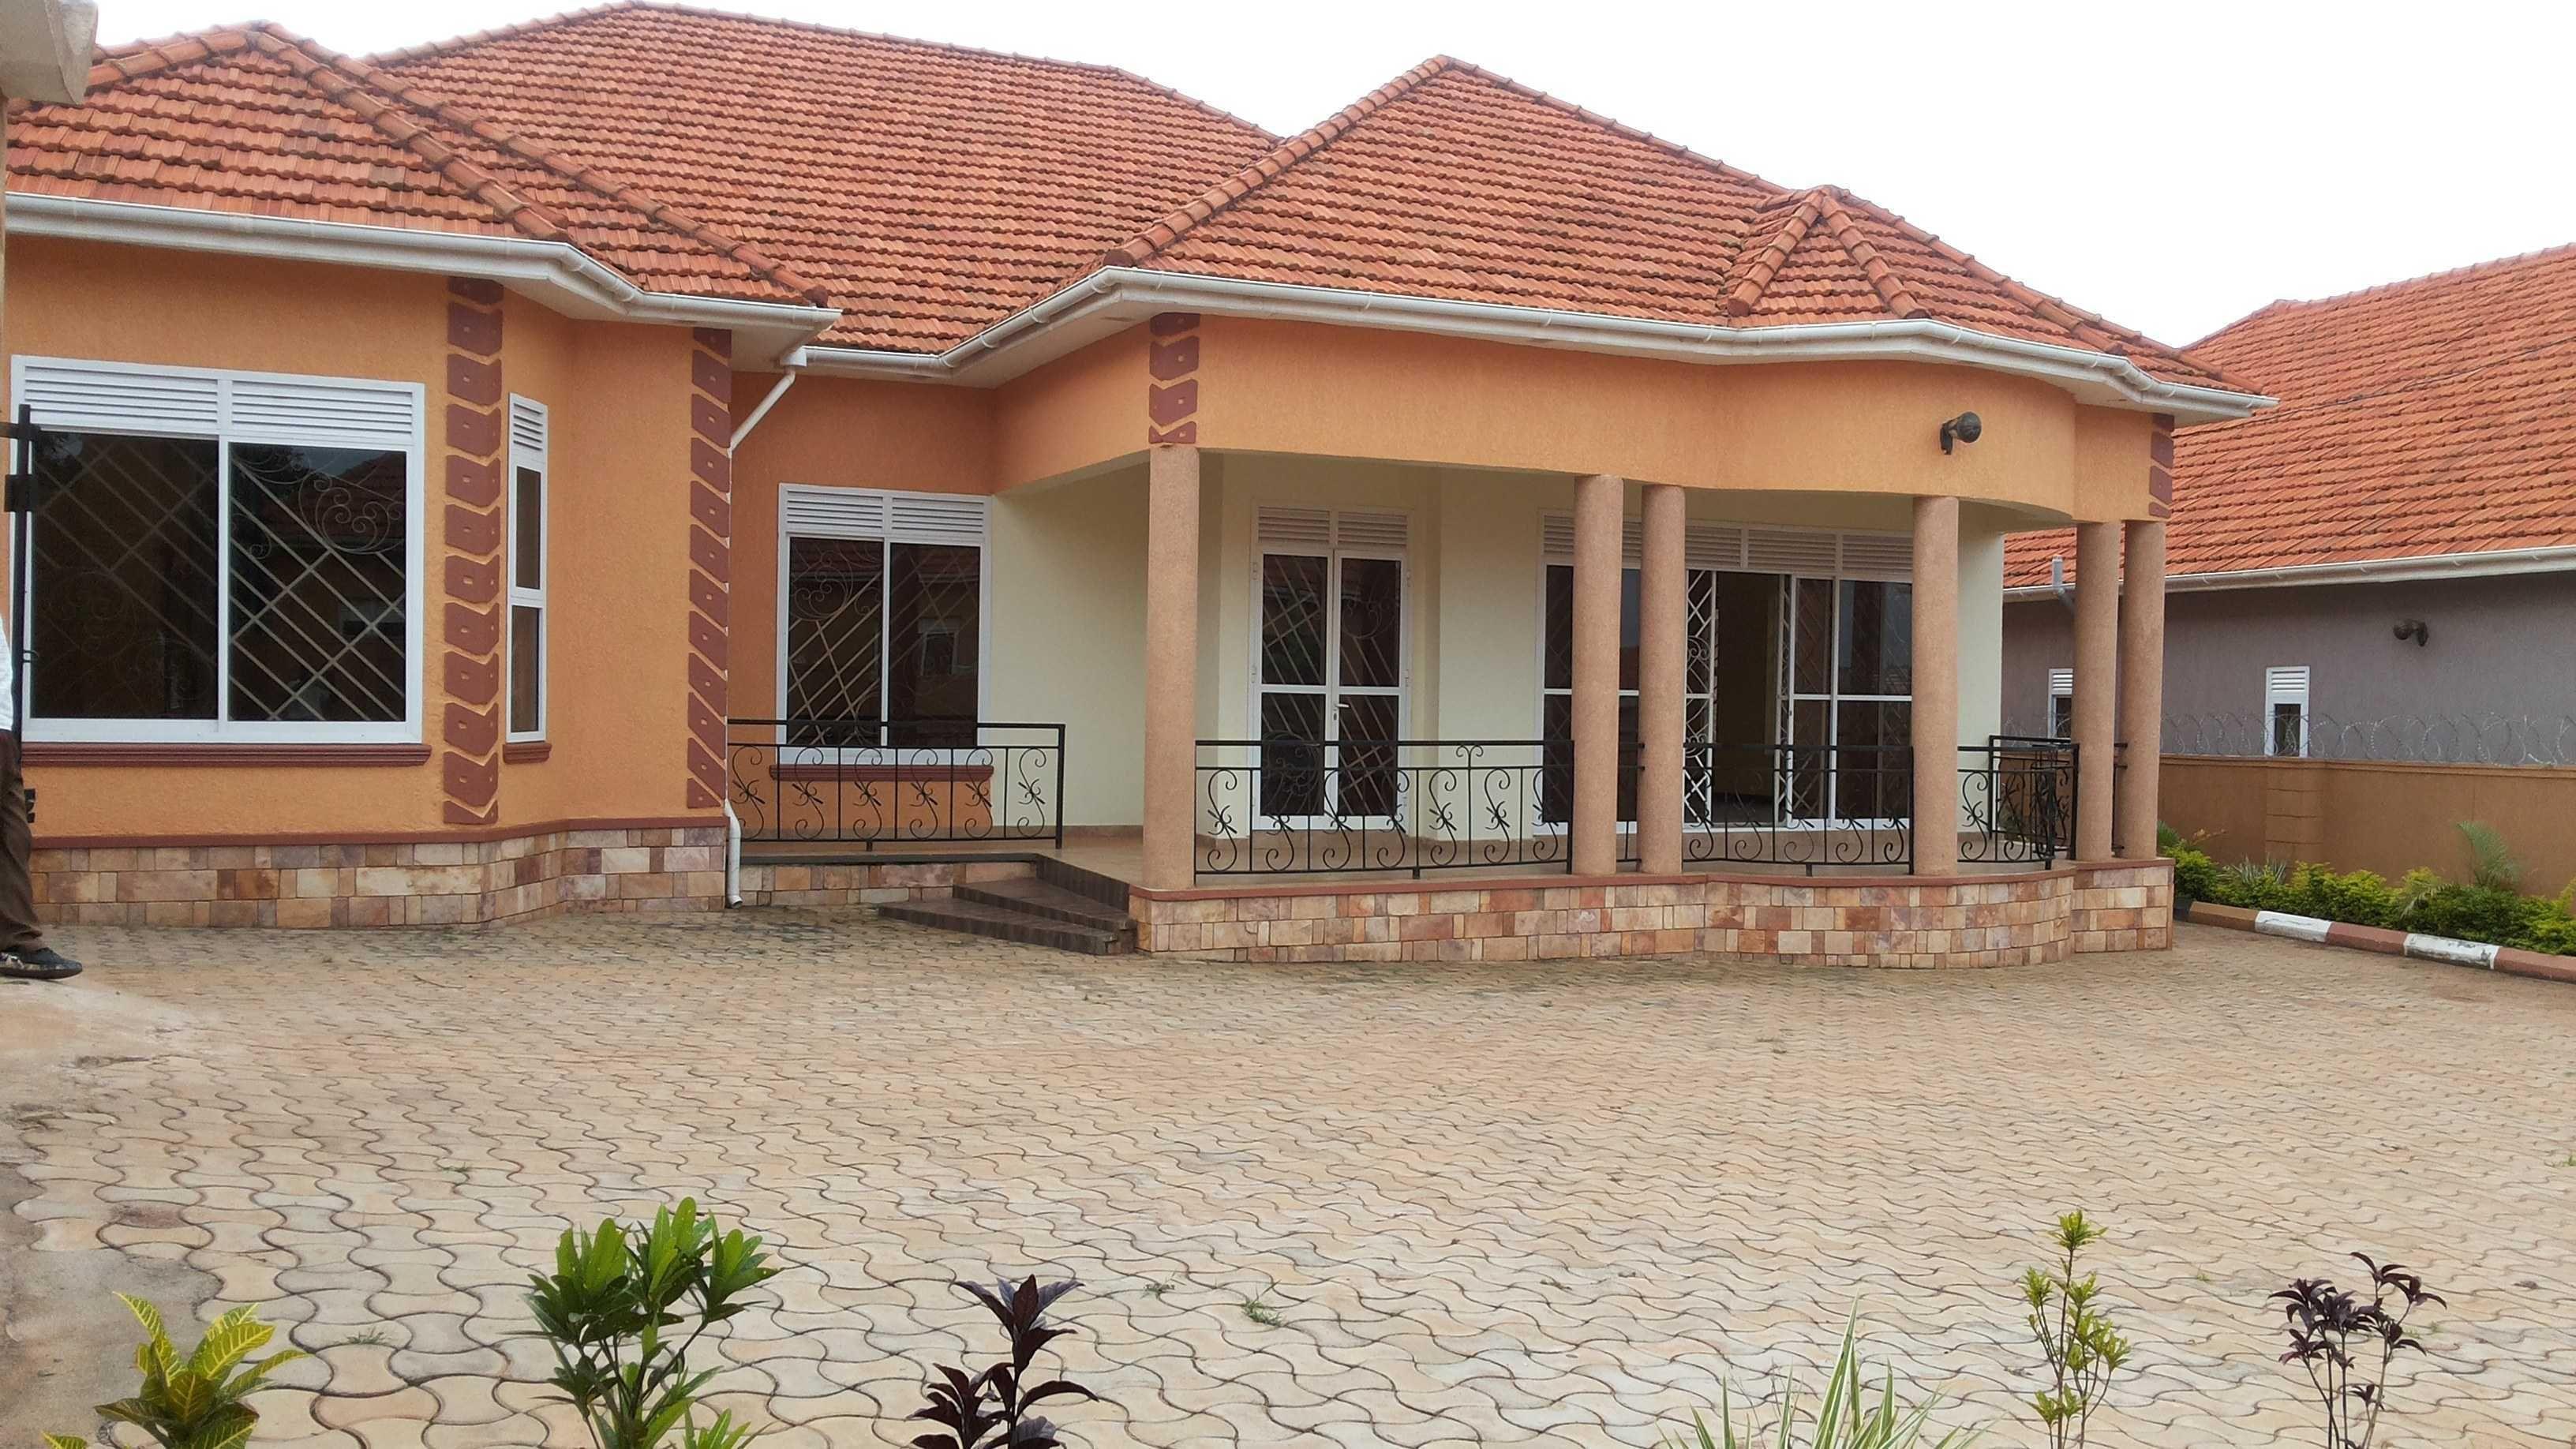 4 Bedroom House Plans In Uganda New Of Residential Houses In